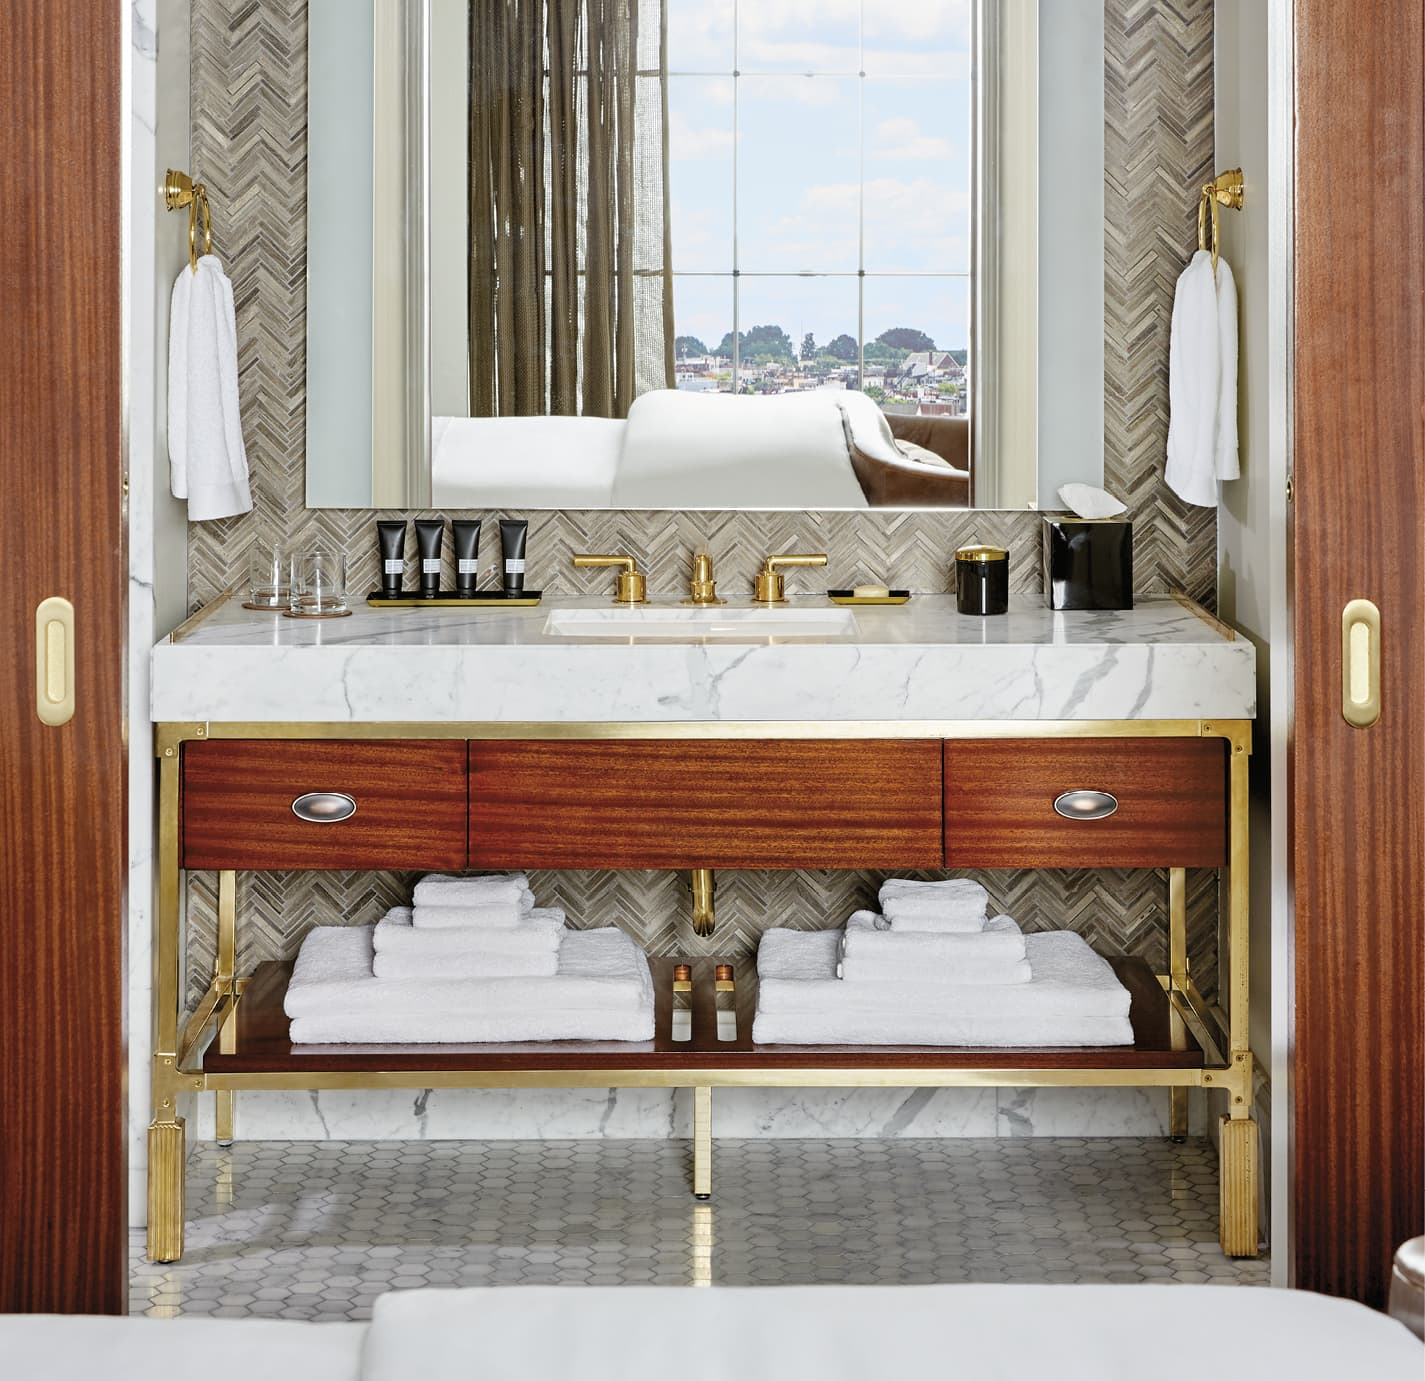 Bathroom vanity with textured walls